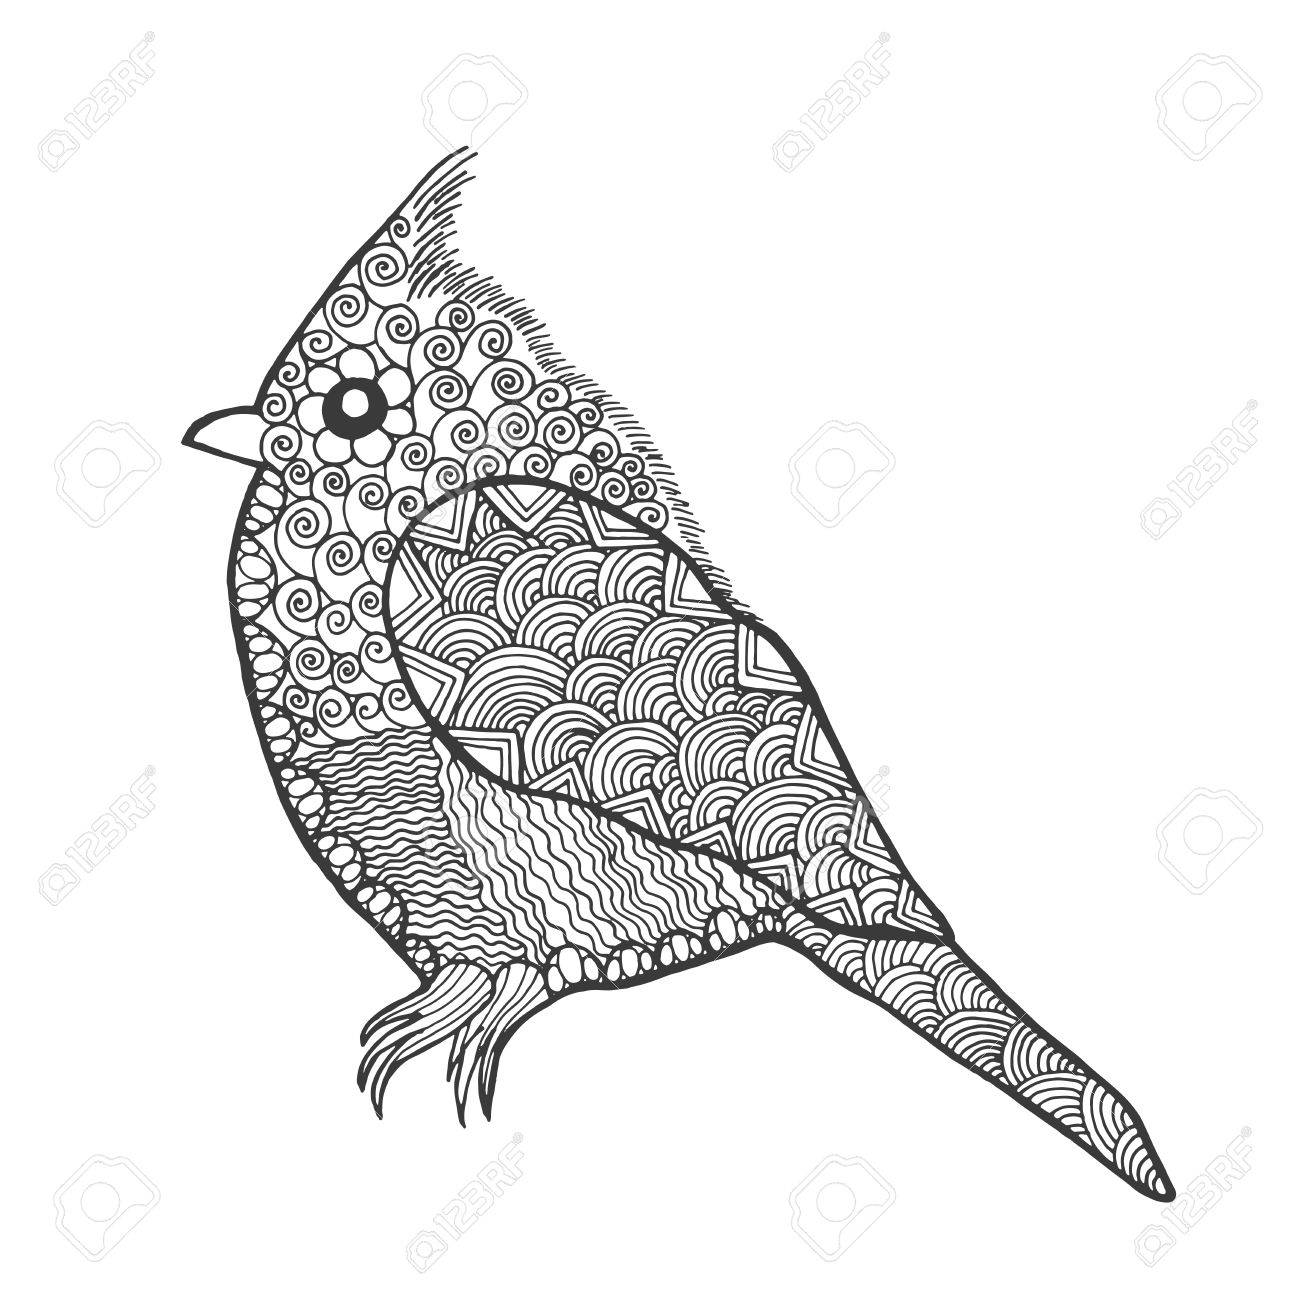 1300x1300 Zentangle Stylized Bird. Animals. Black White Hand Drawn Doodle